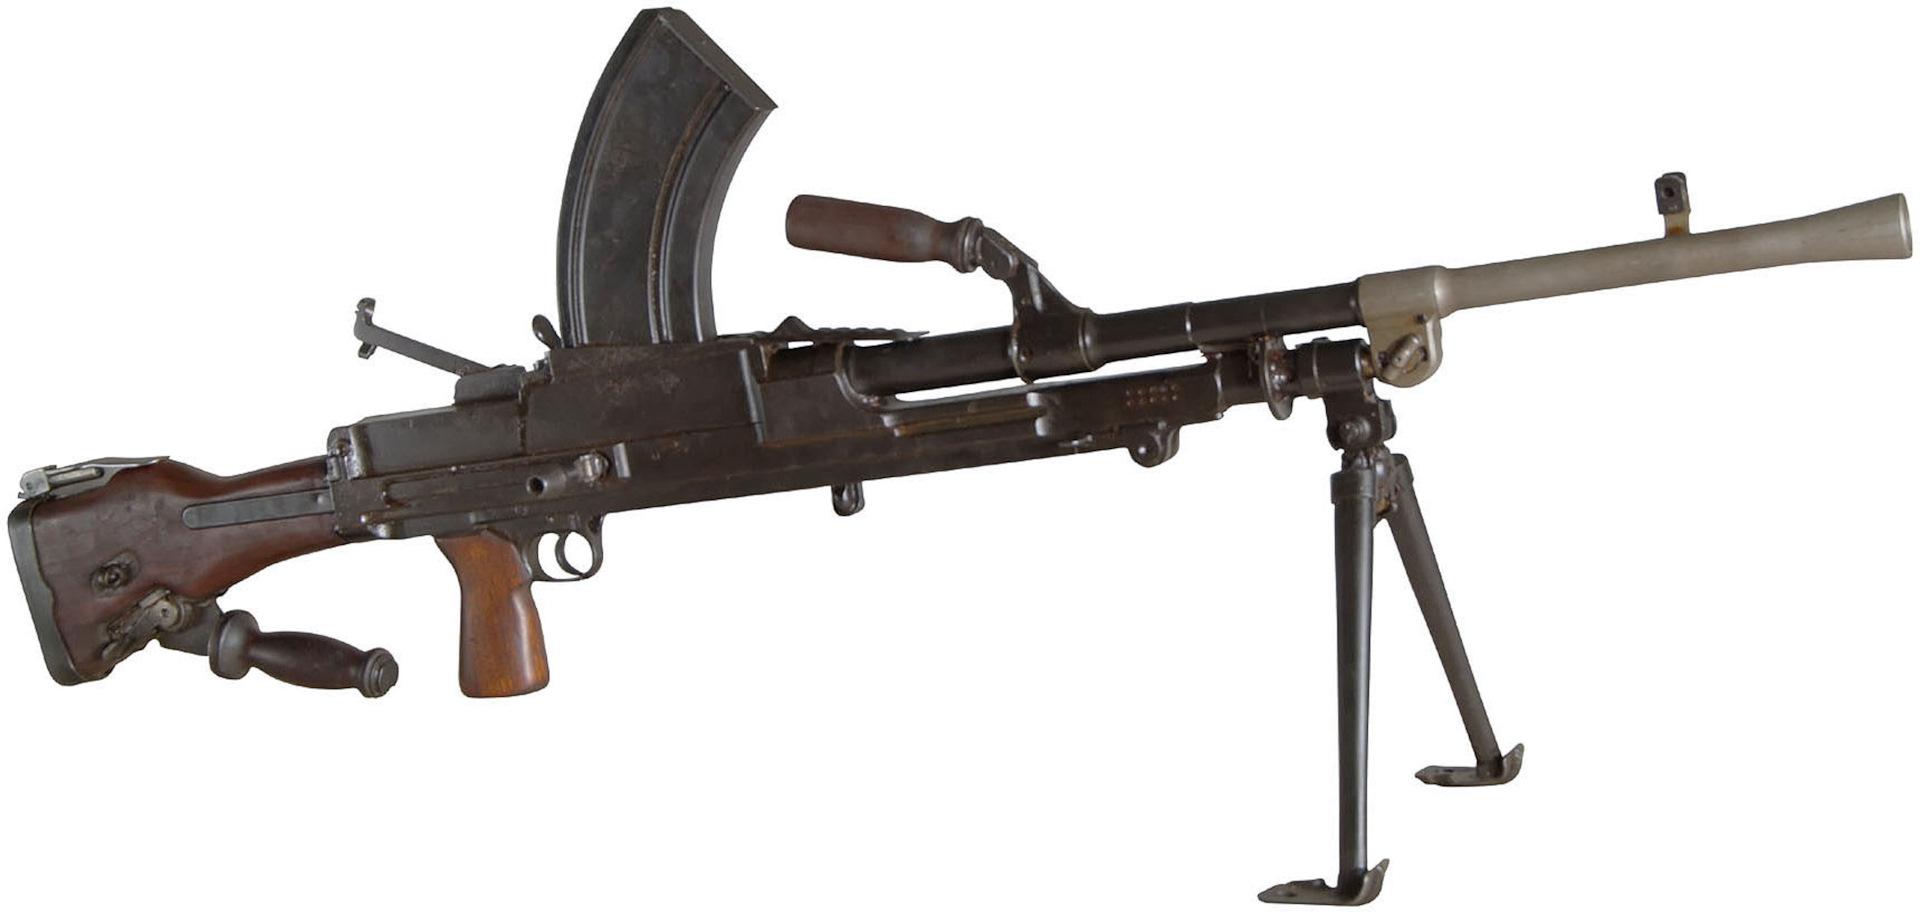 Image result for ww2 bren light machine gun